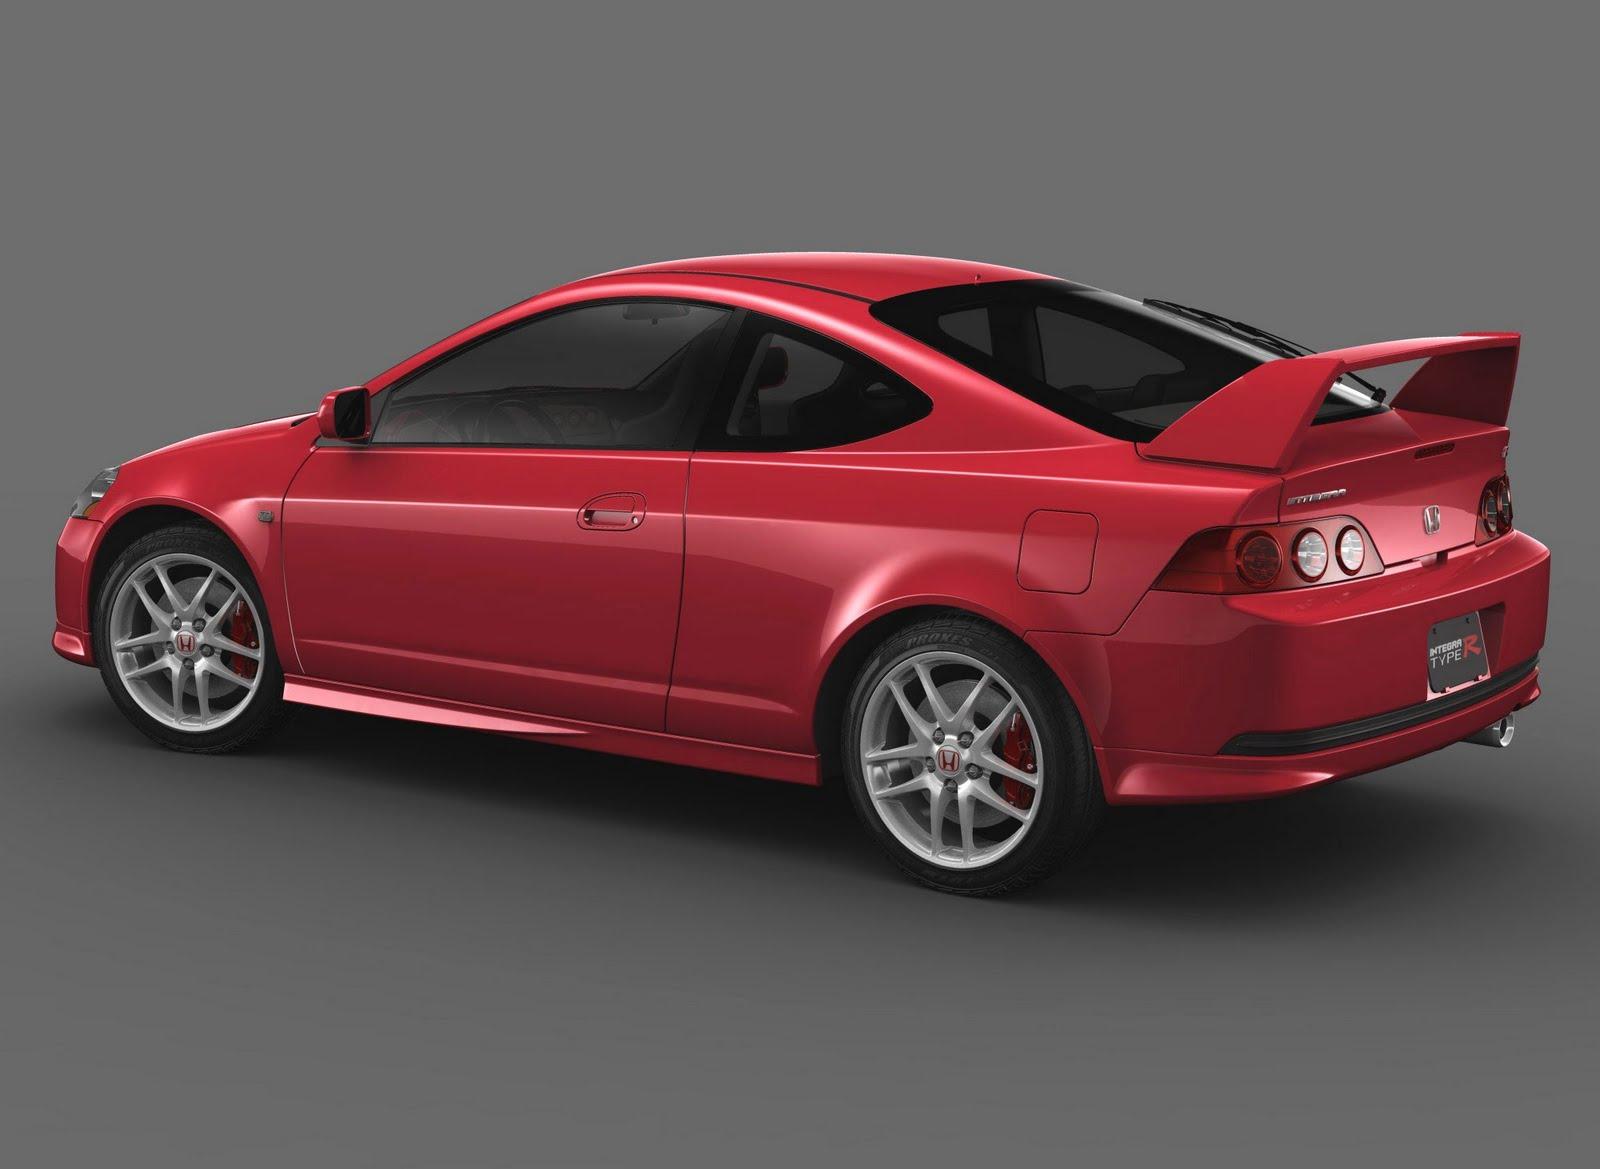 wallpaper zh honda cars models 1600x1169